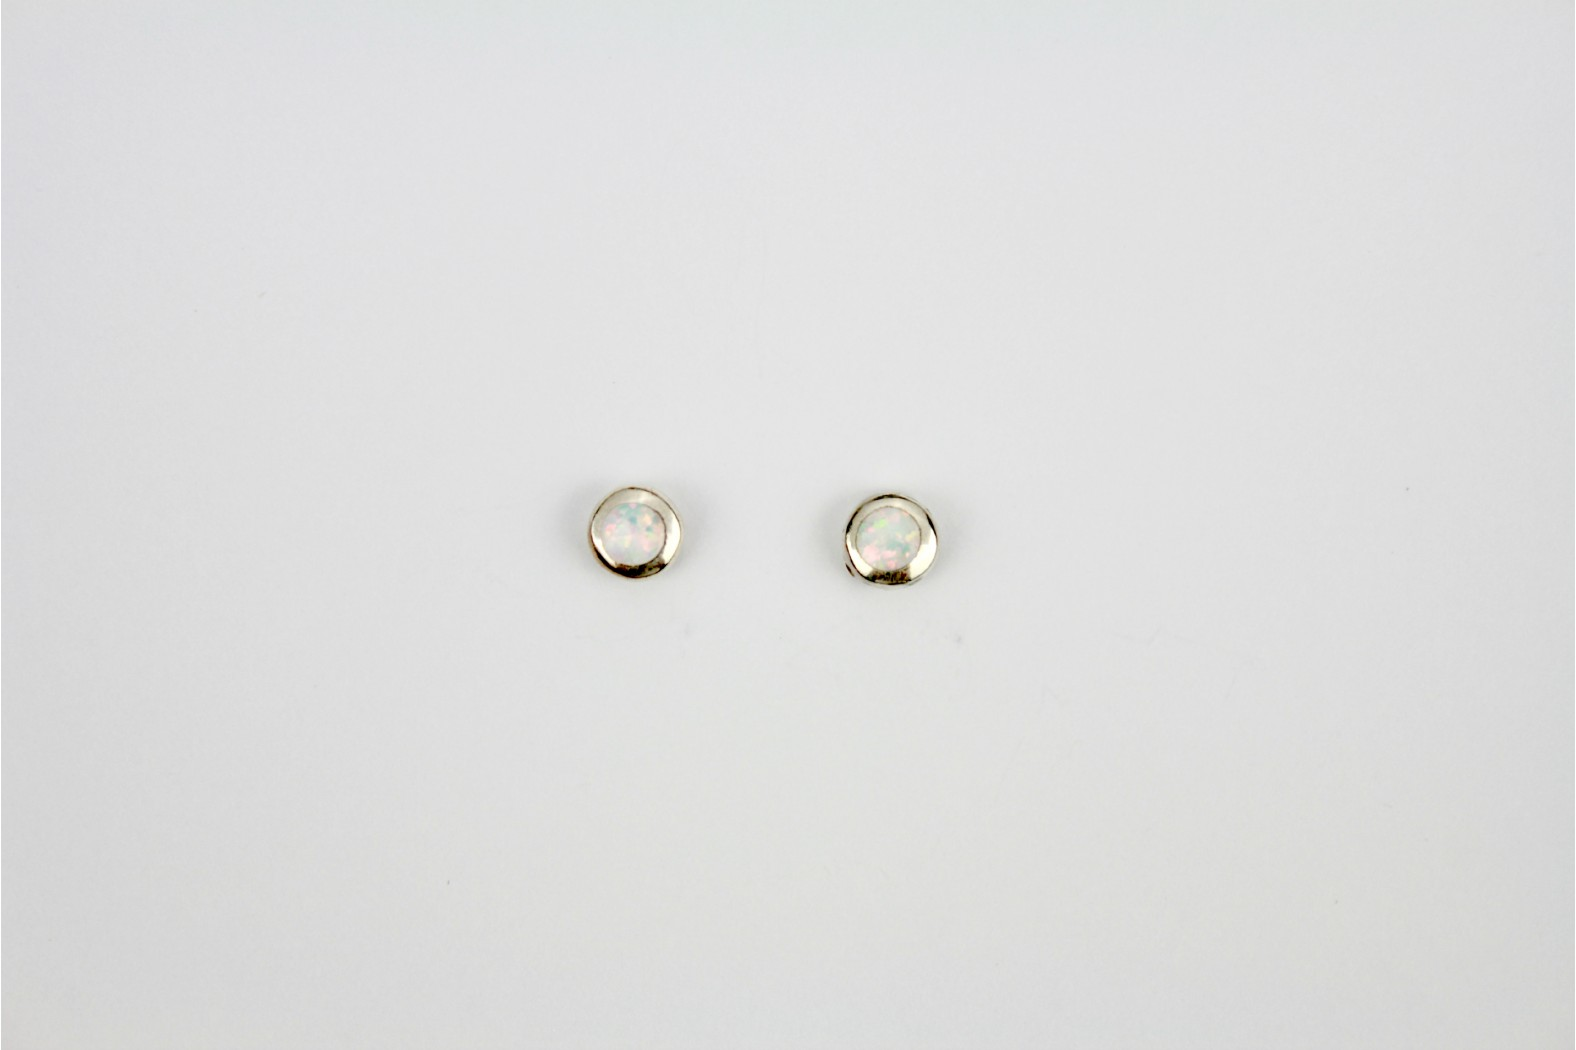 White Opal Fire circular stud earrings medium